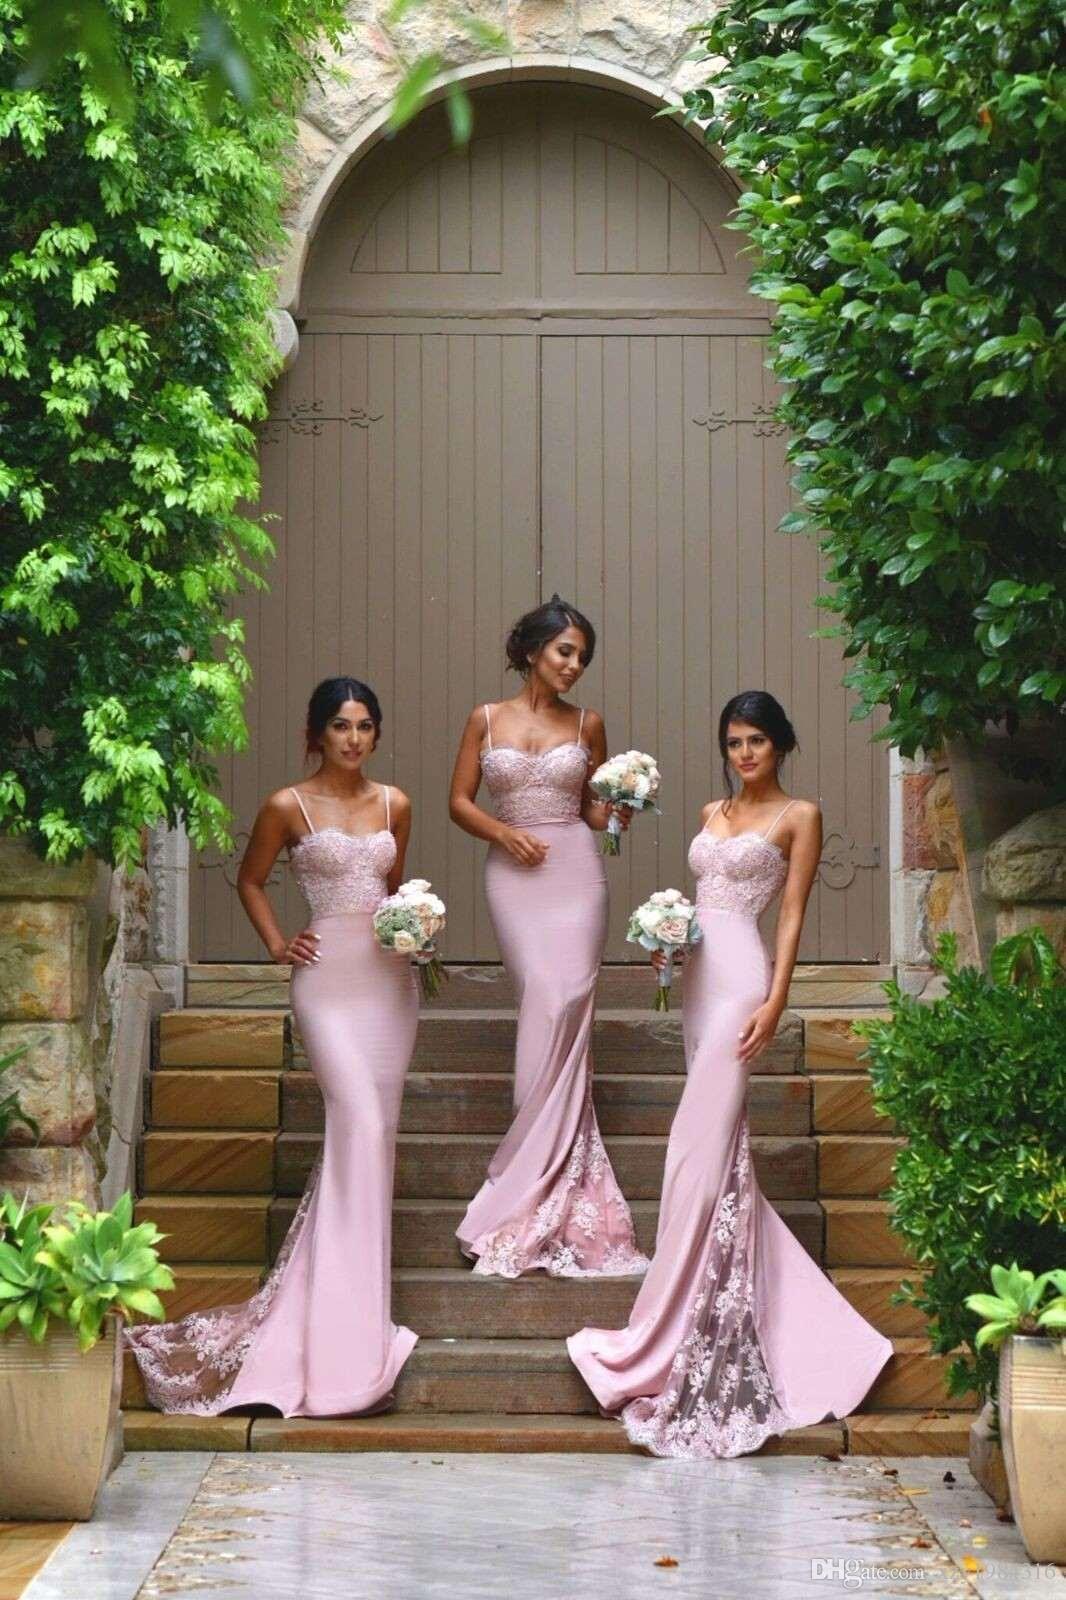 Spaghetti Straps Lace Satin Bridesmaid Dresses Skirt Train Lace Appliques  Blush Pink Mermaid Cheap Prom Dresses Bodycon Evening Dresses 8ab512028944